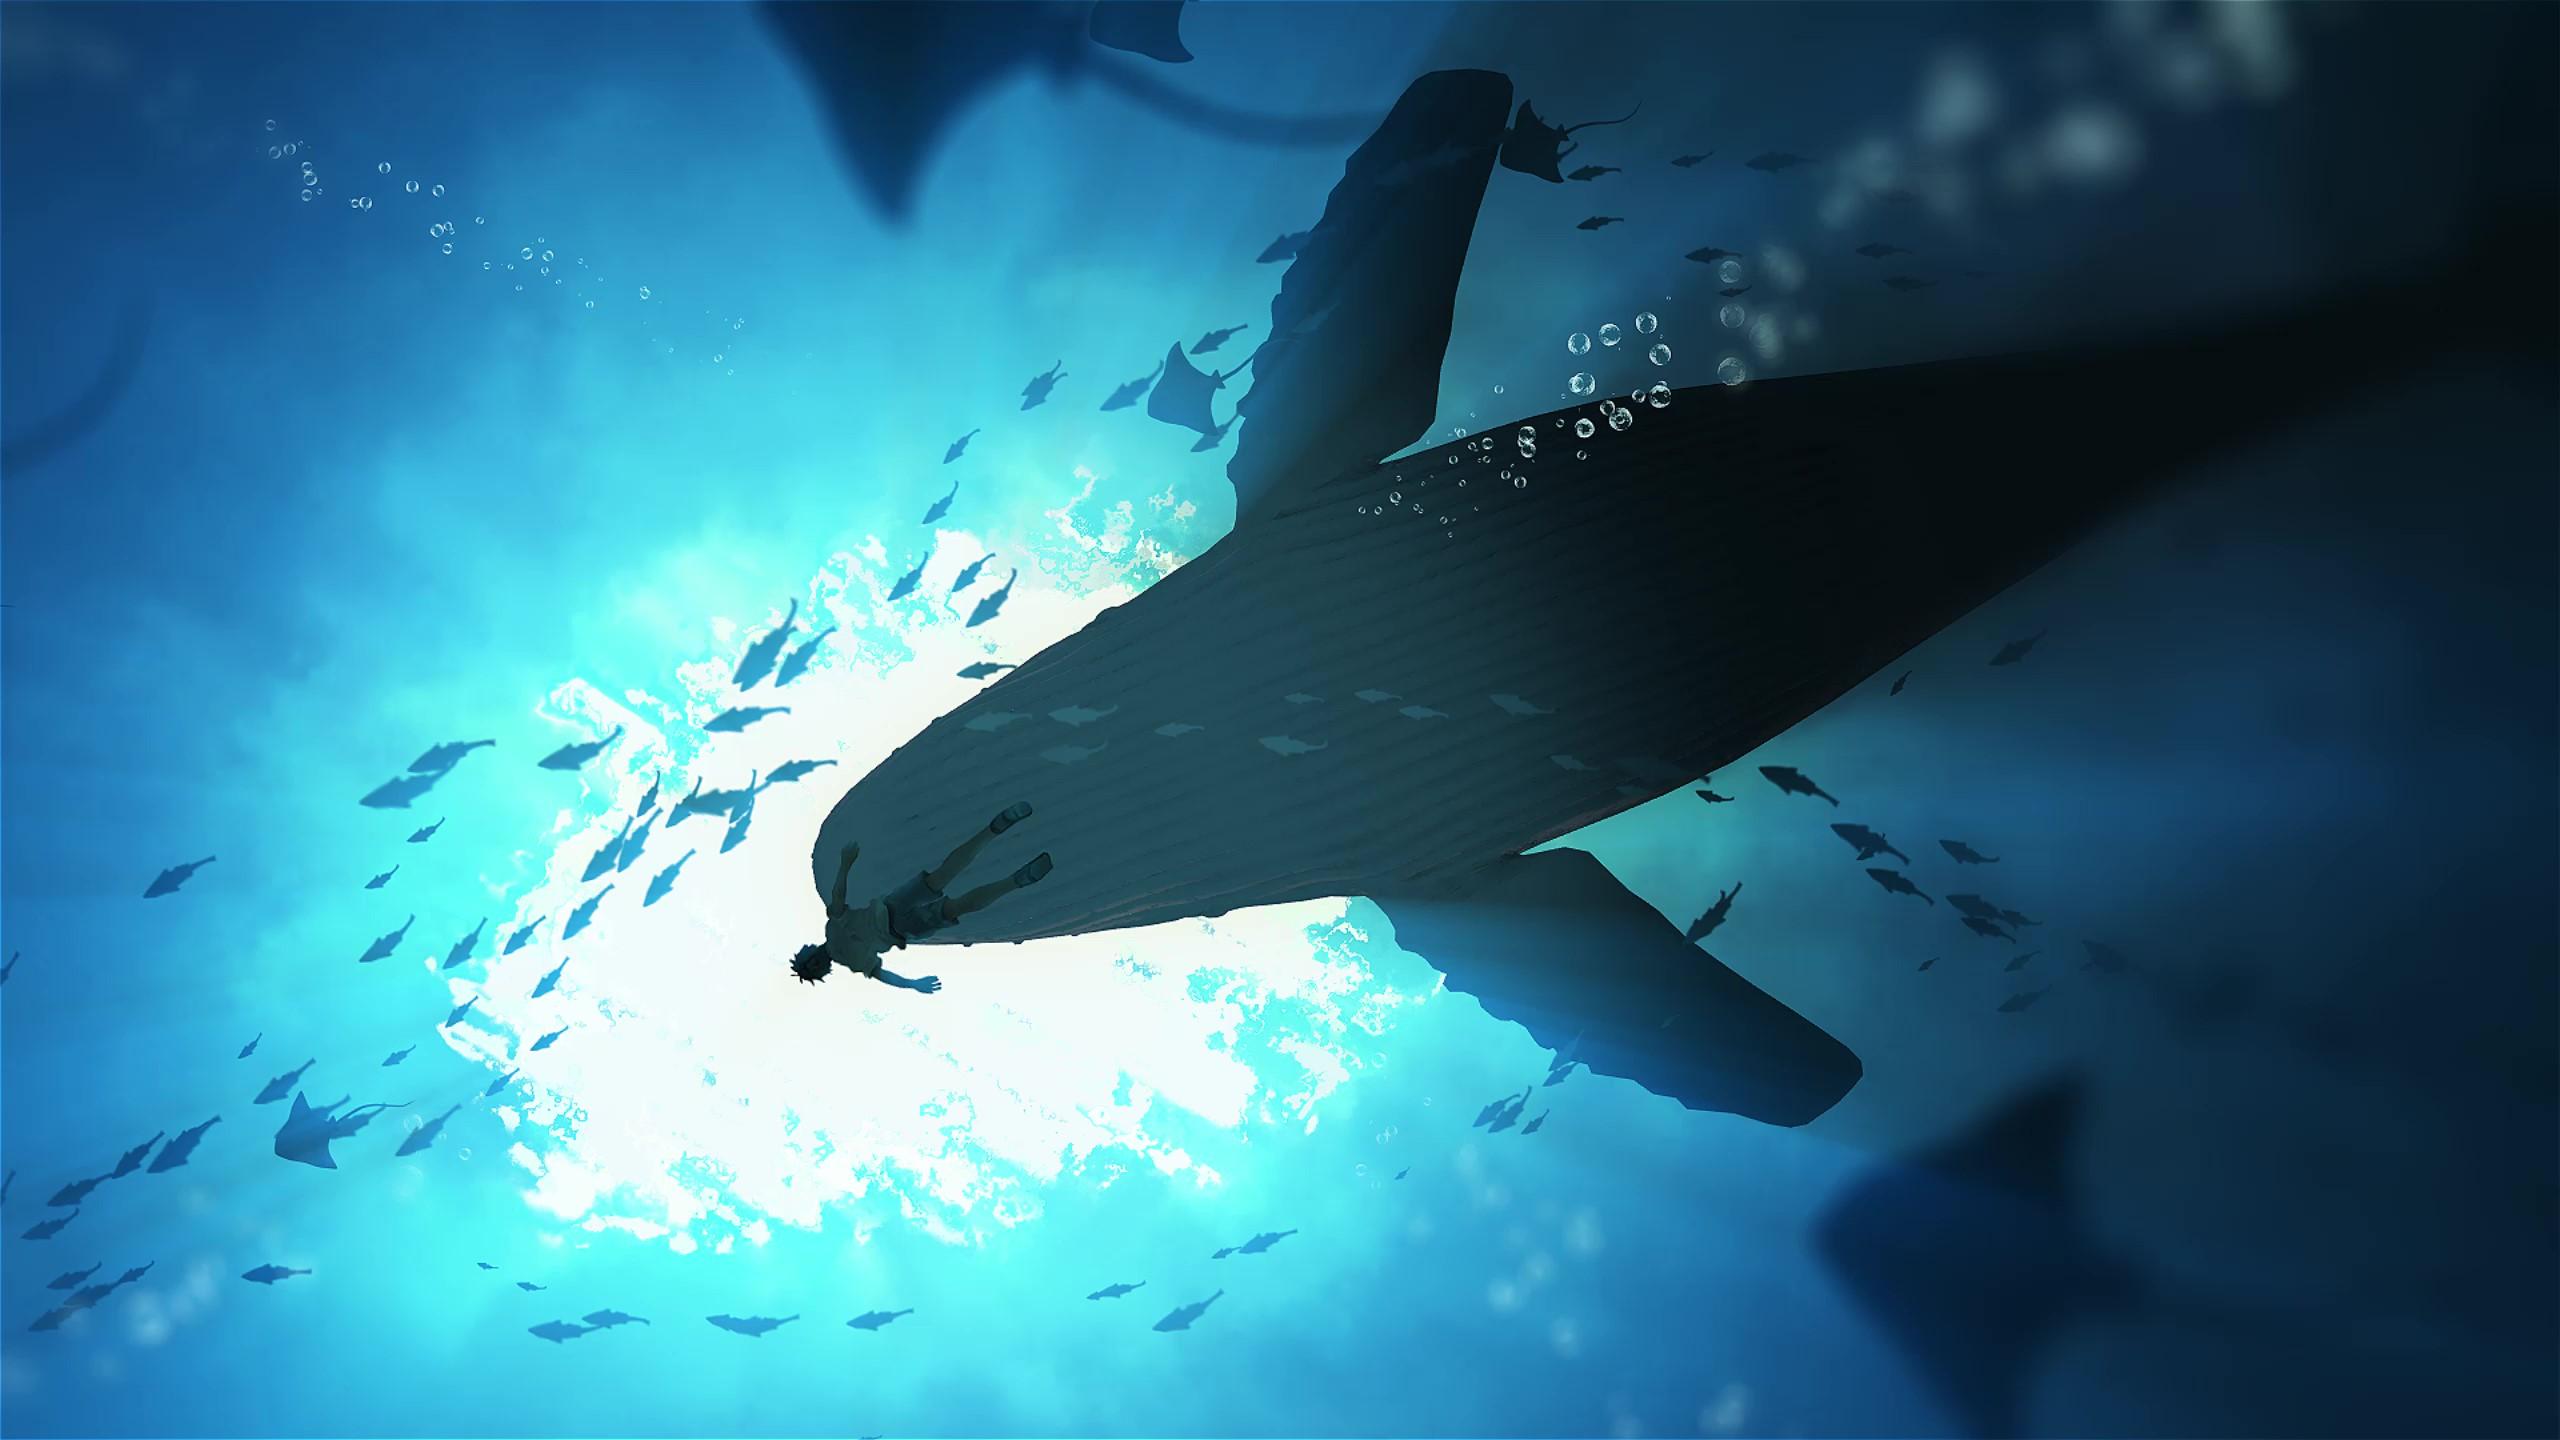 Underwater Live Wallpaper With Whales Original By Nightcoregang On Deviantart